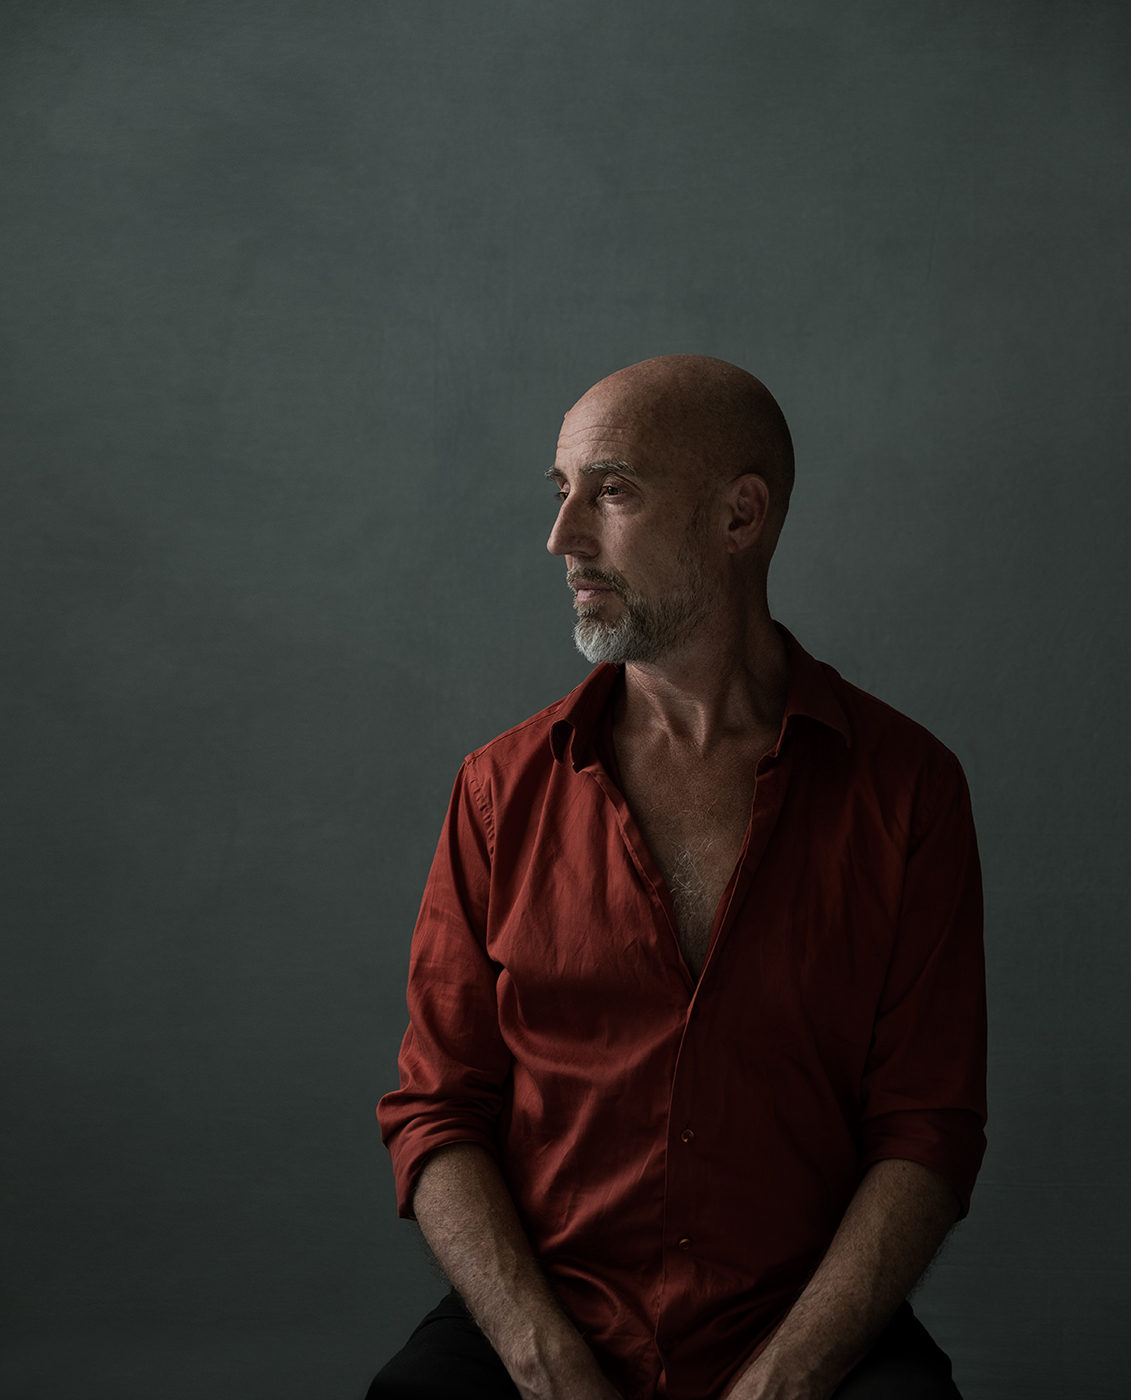 portret, portrait, portretfotografie, Susanne Middelberg